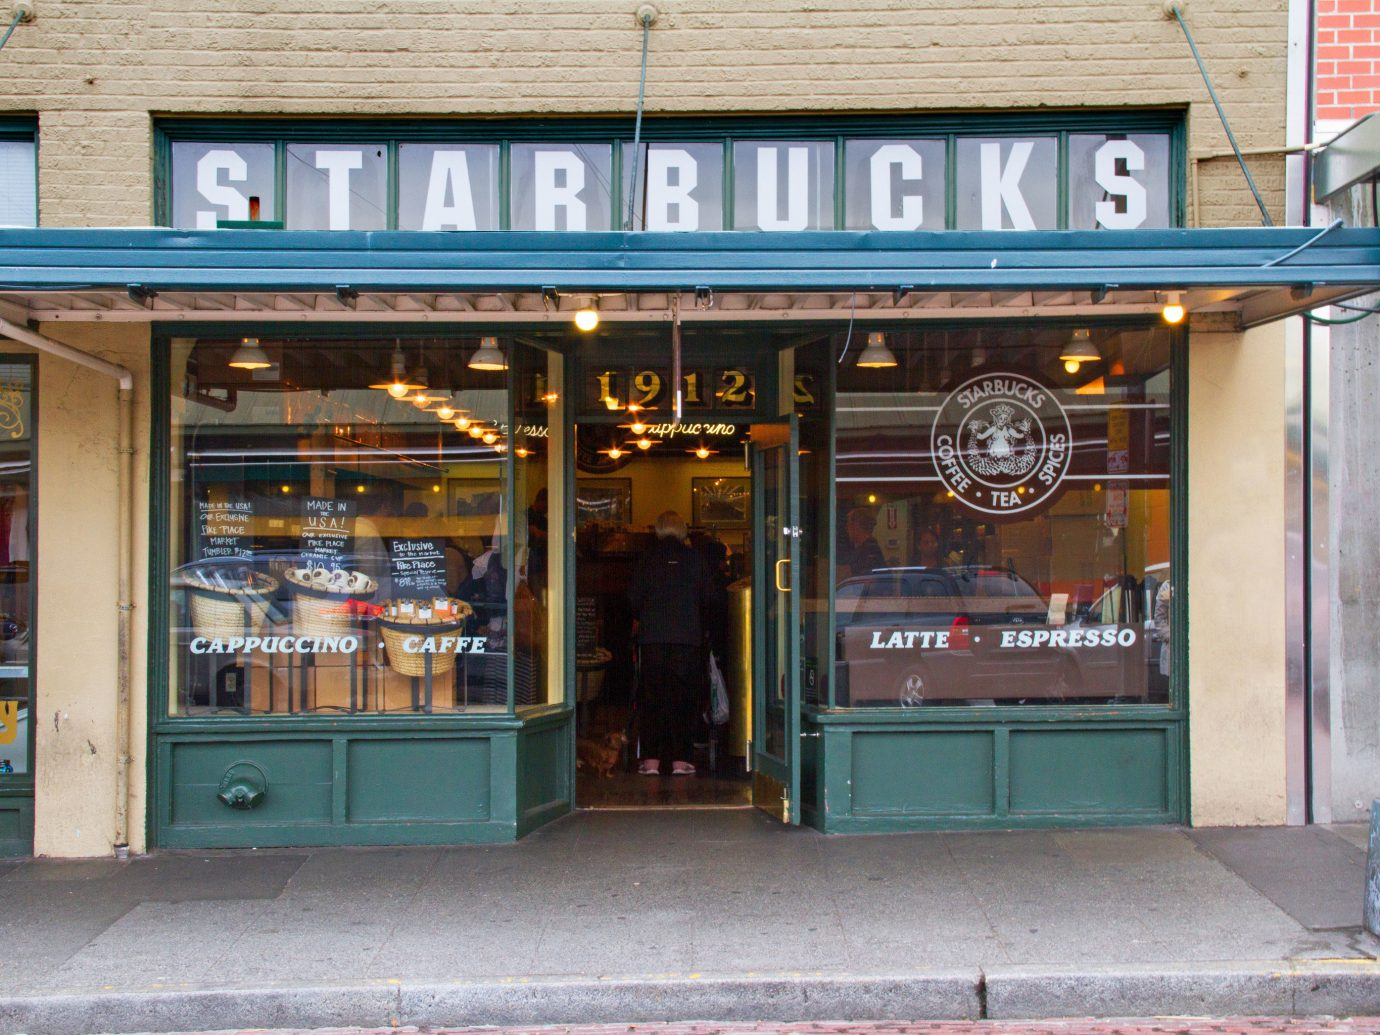 Trip Ideas building outdoor store urban area Shop bookselling street shopping facade retail restaurant